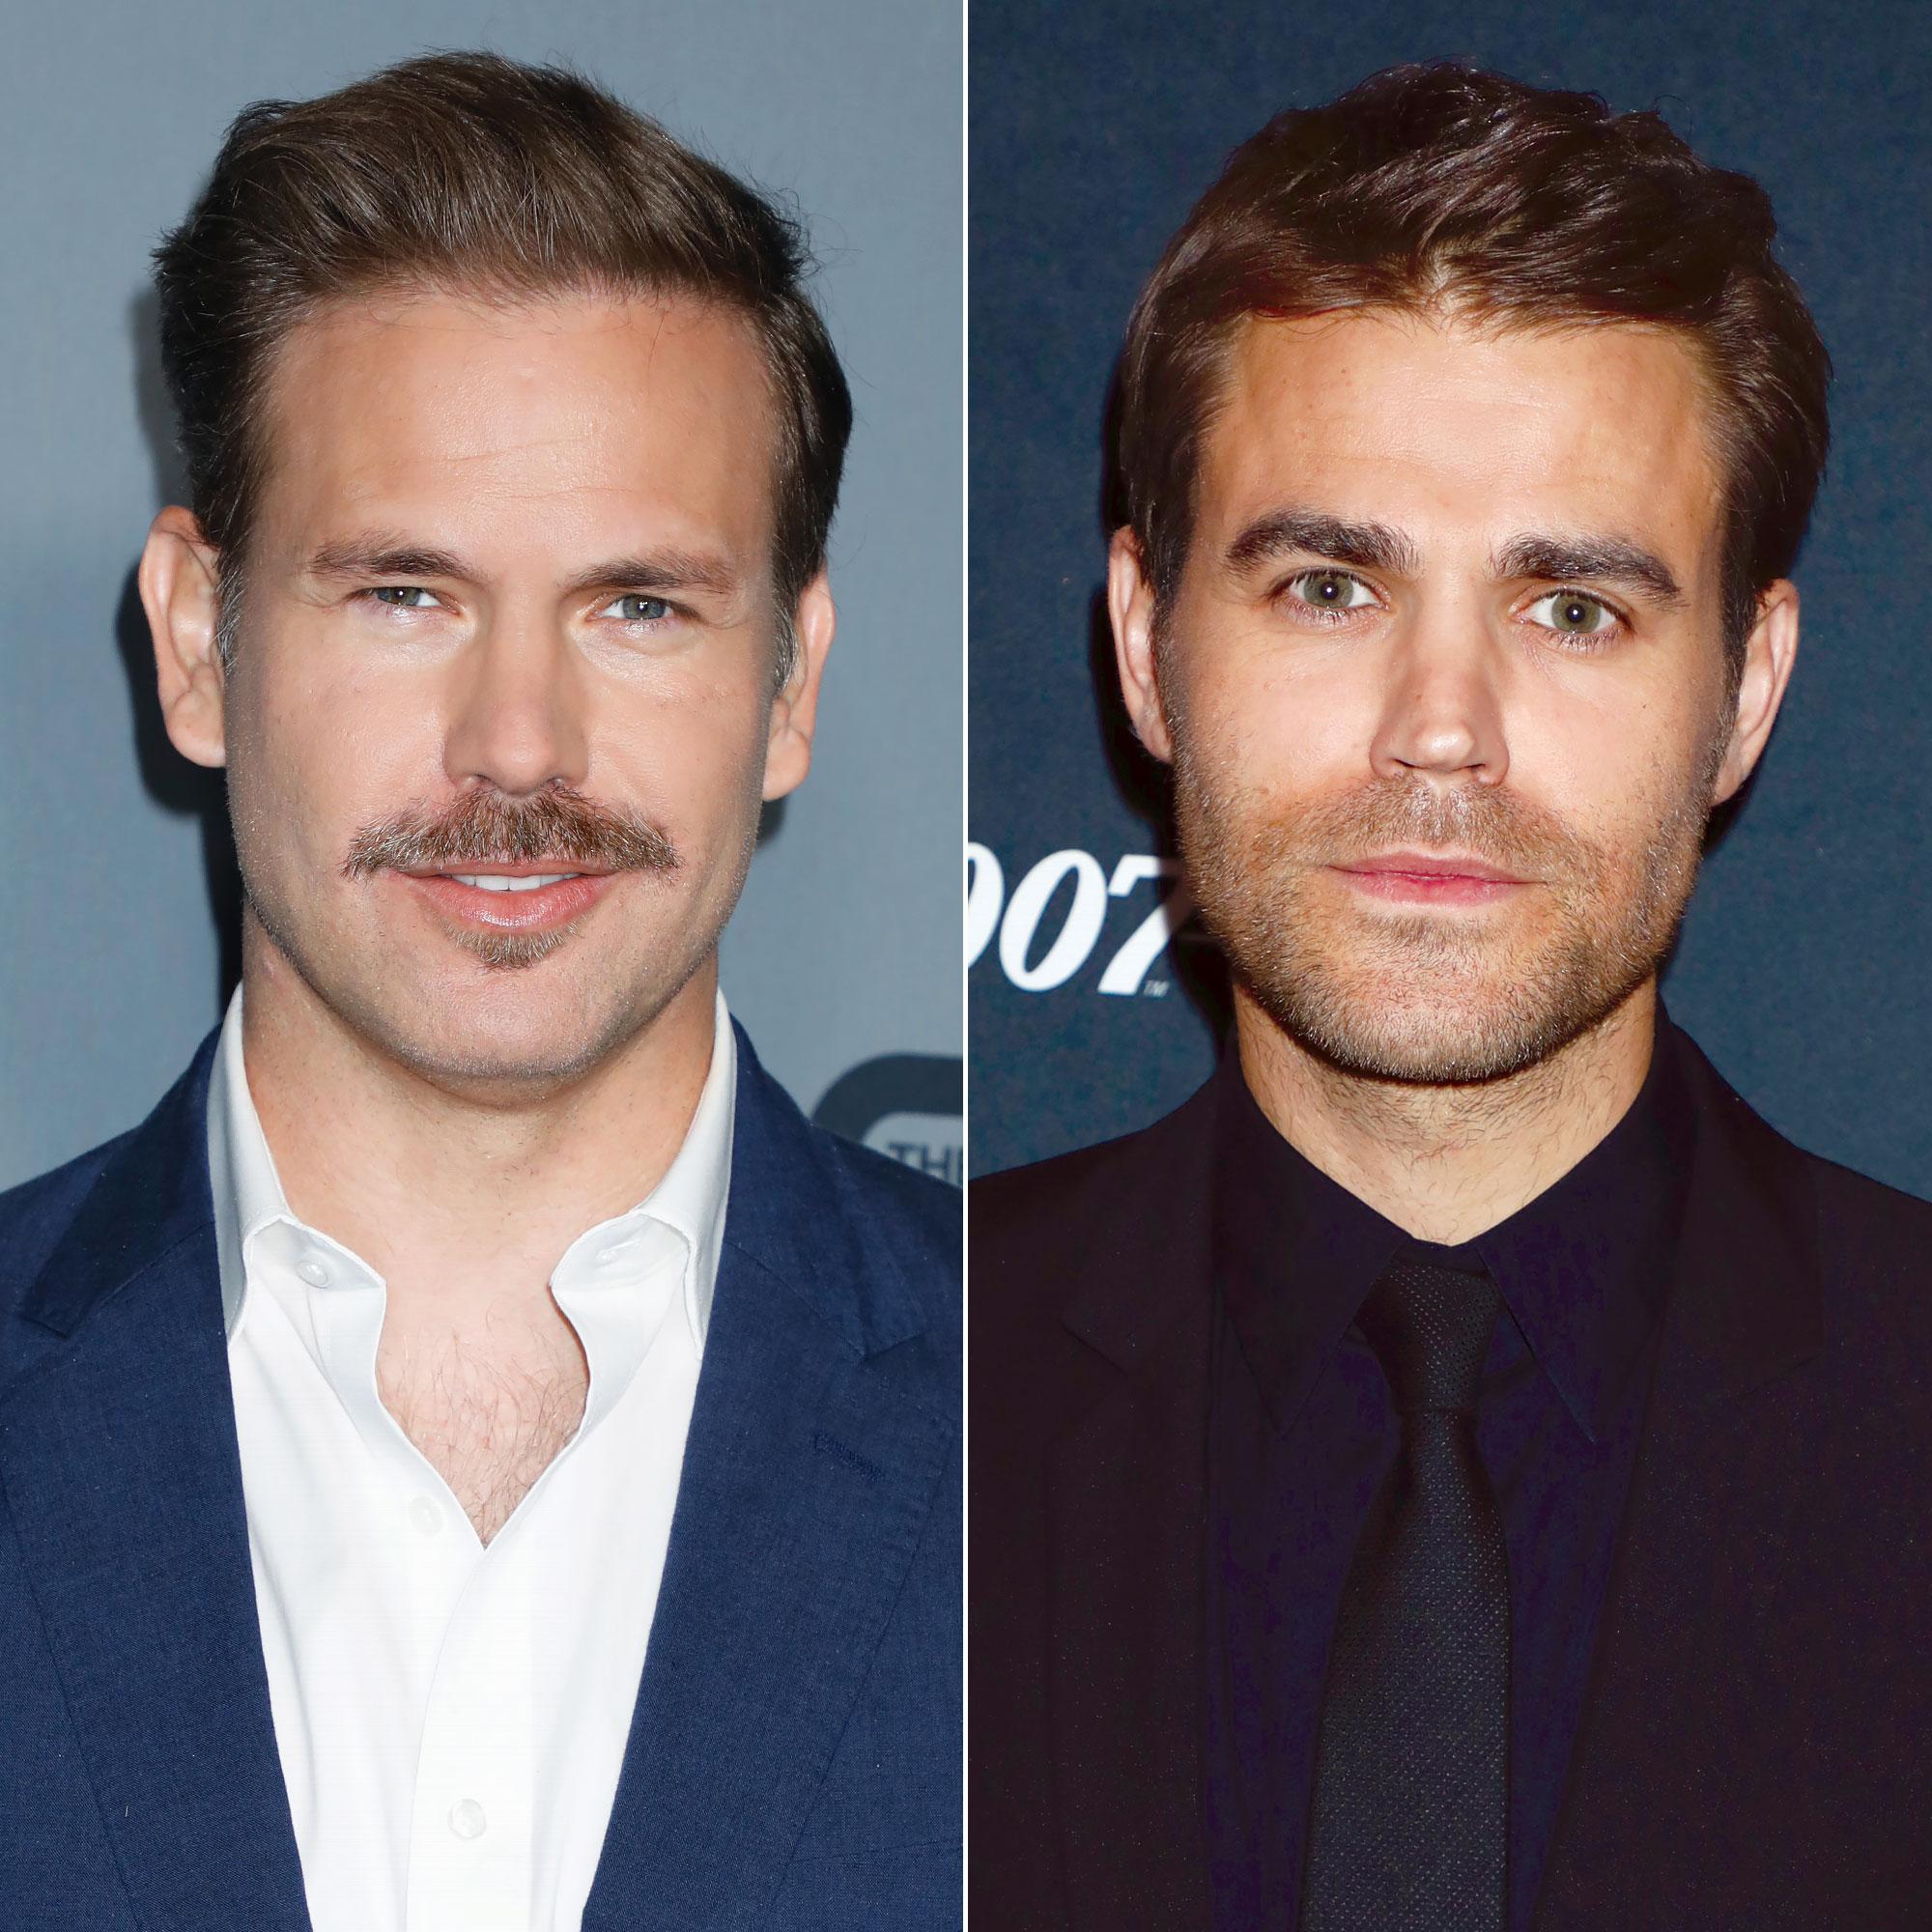 Vampire Diaries' Matthew Davis Apologizes After Paul Wesley Twitter Spat